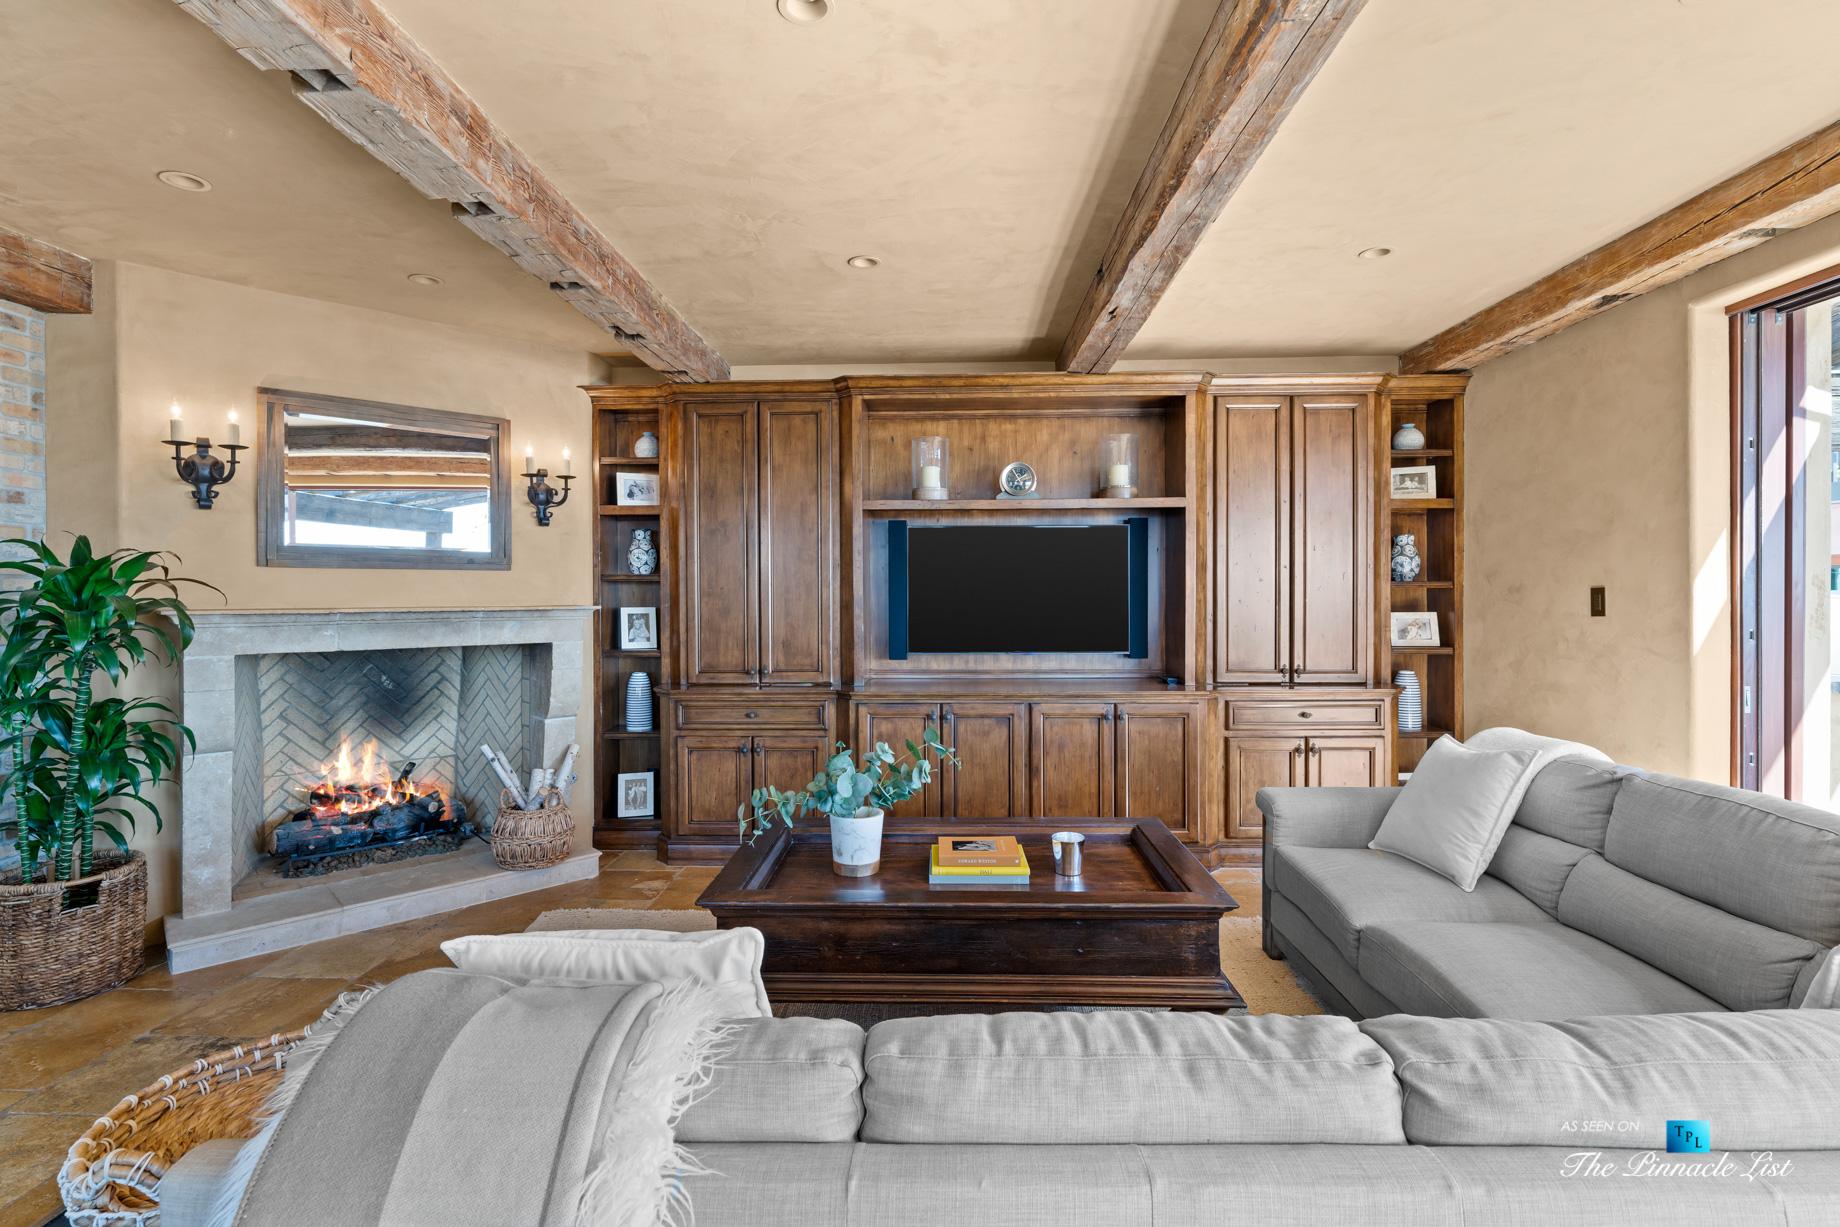 216 7th St, Manhattan Beach, CA, USA - Luxury Real Estate - Coastal Villa Home - Living Room